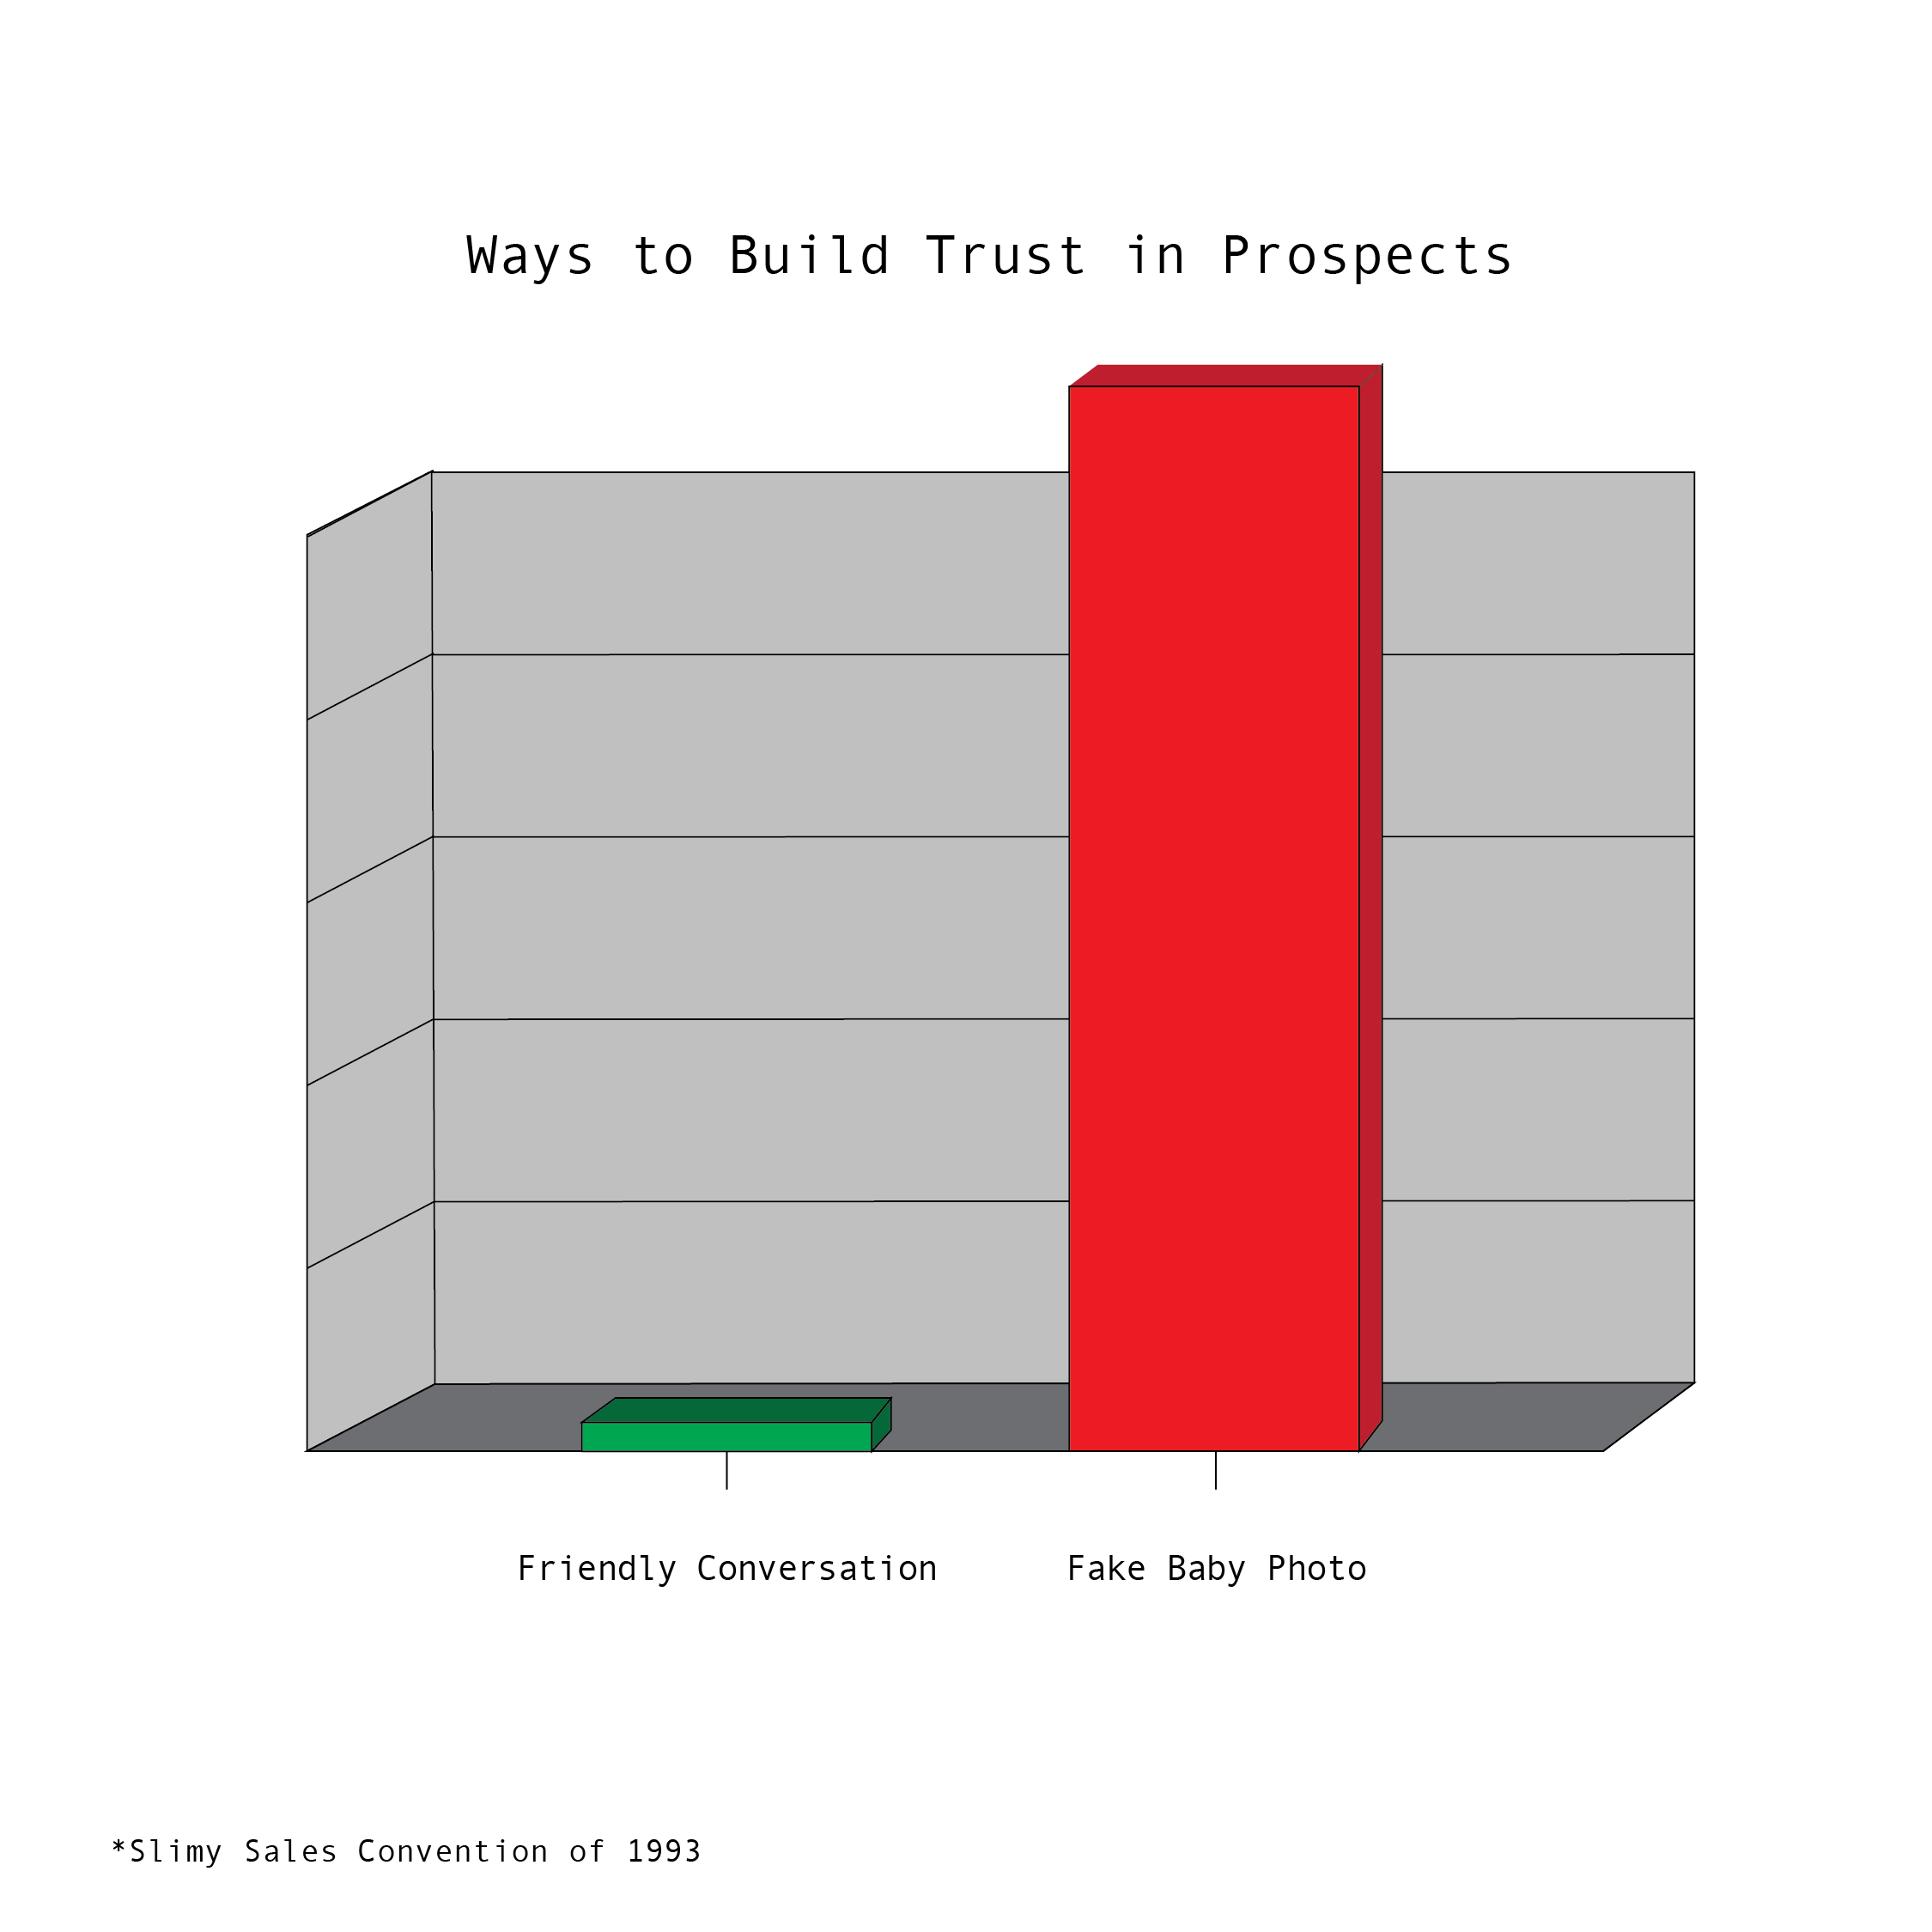 SlimySales_Charts_ChartsGraphs3-08.png